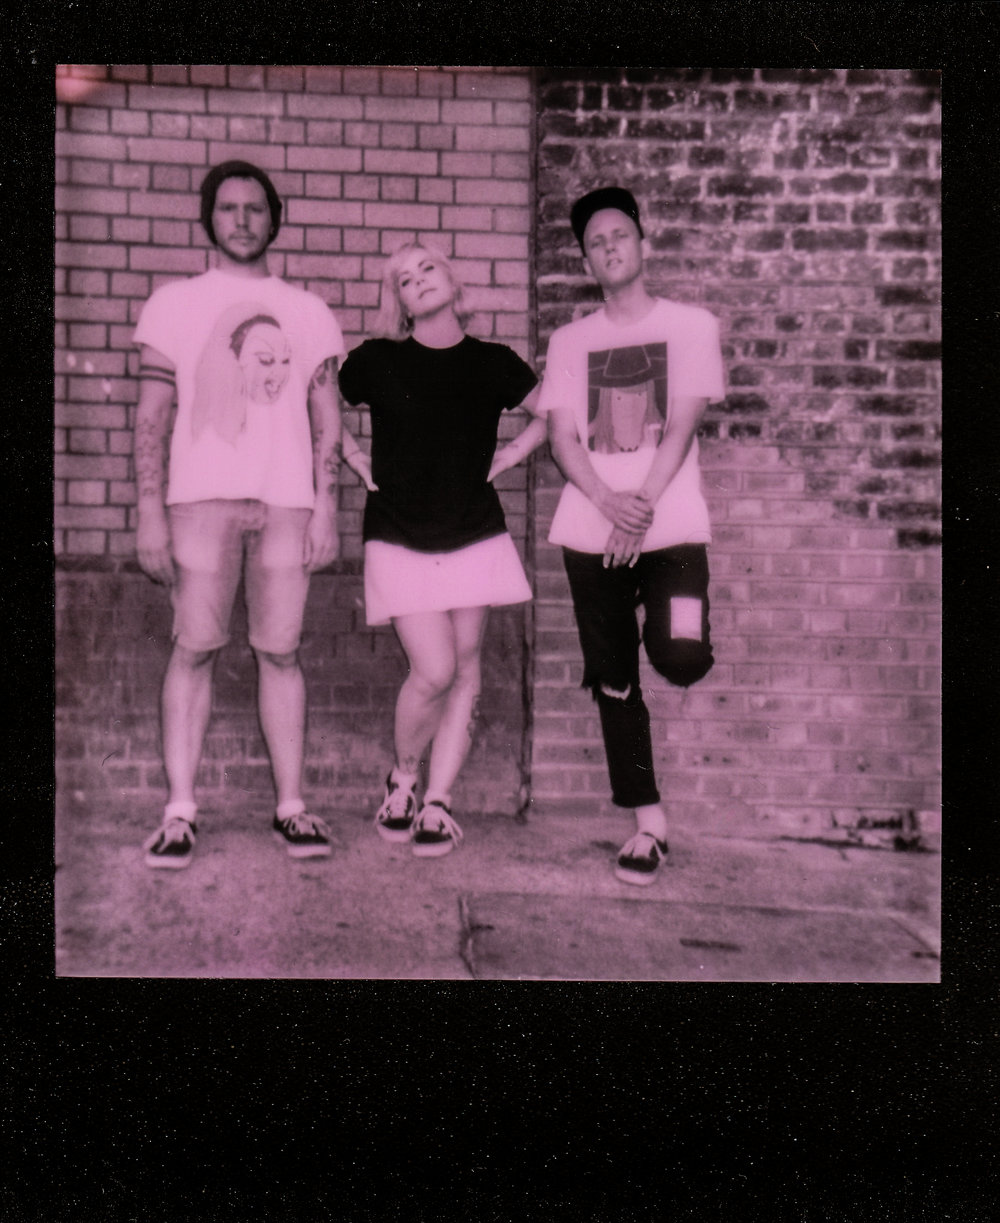 Doe Polaroids - Corsica Studios - 21.06.2017 - Ant Adams-3.jpg